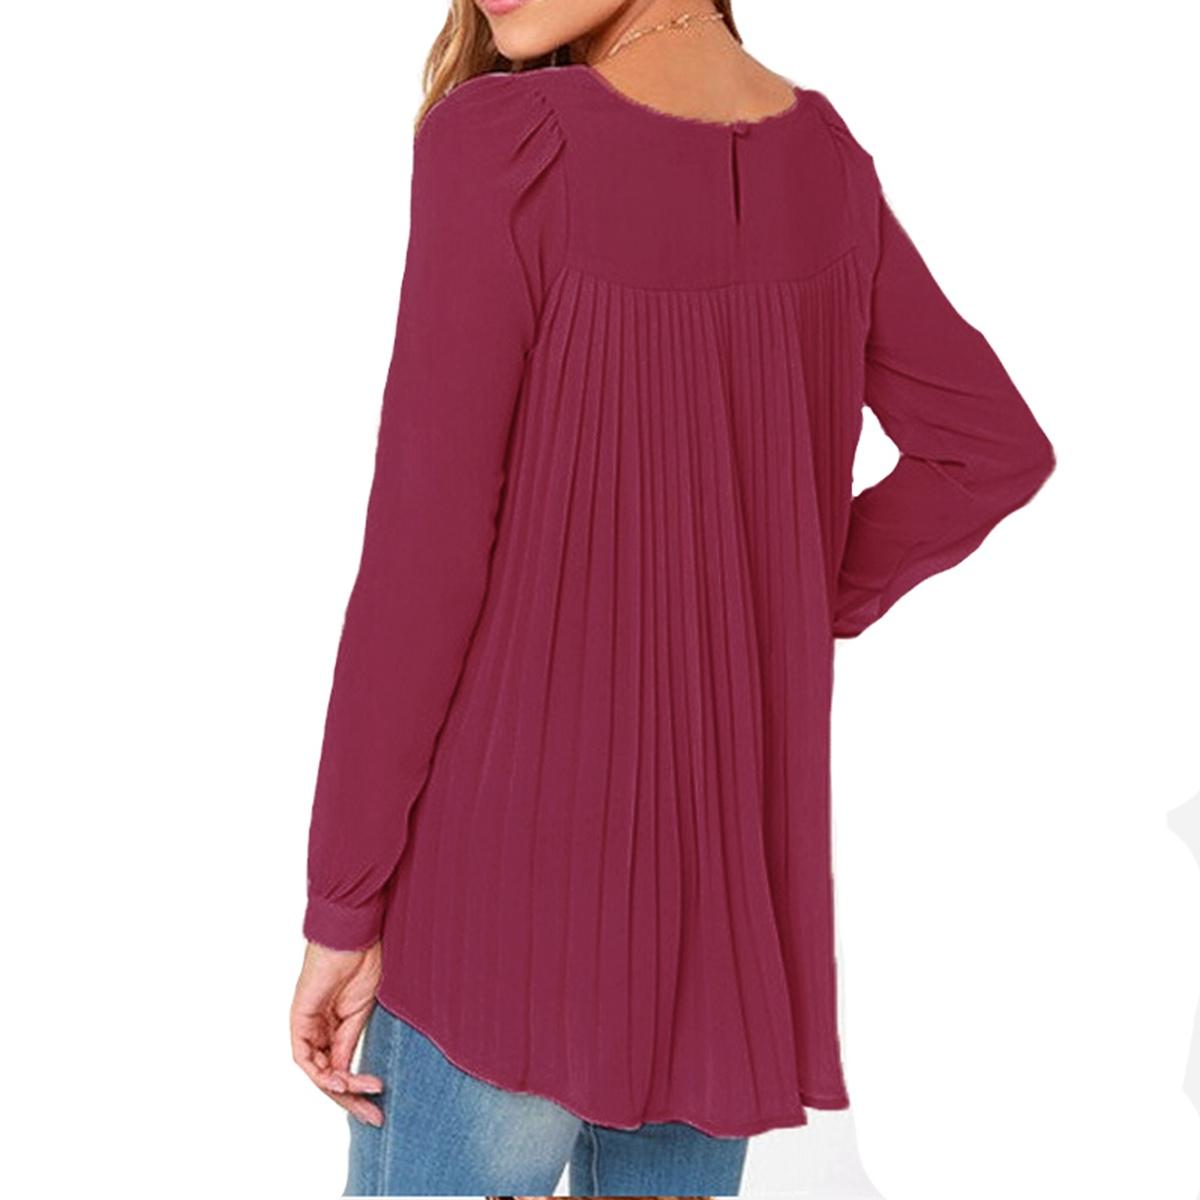 Каталог женских блузок в самаре